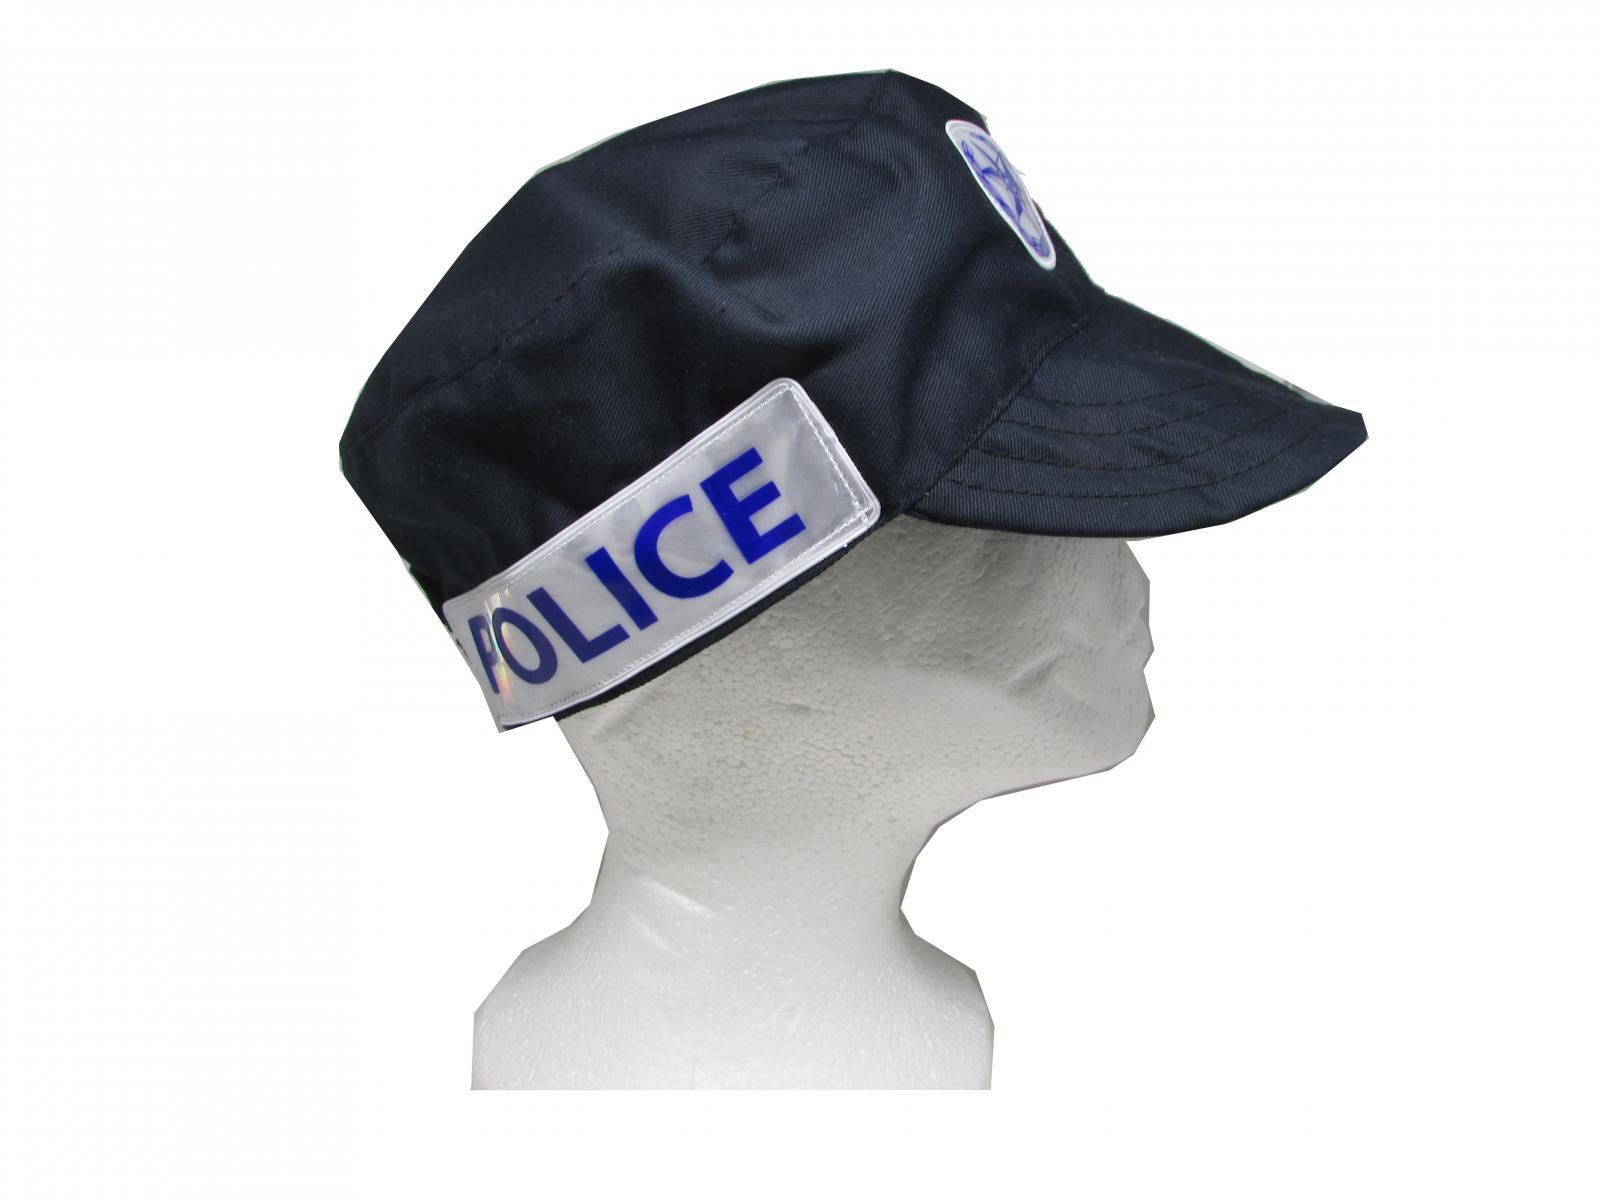 d26eb5ed515 Israel Police Men Hat Cap Hats 100 Cotton Blue Fabric Policemen